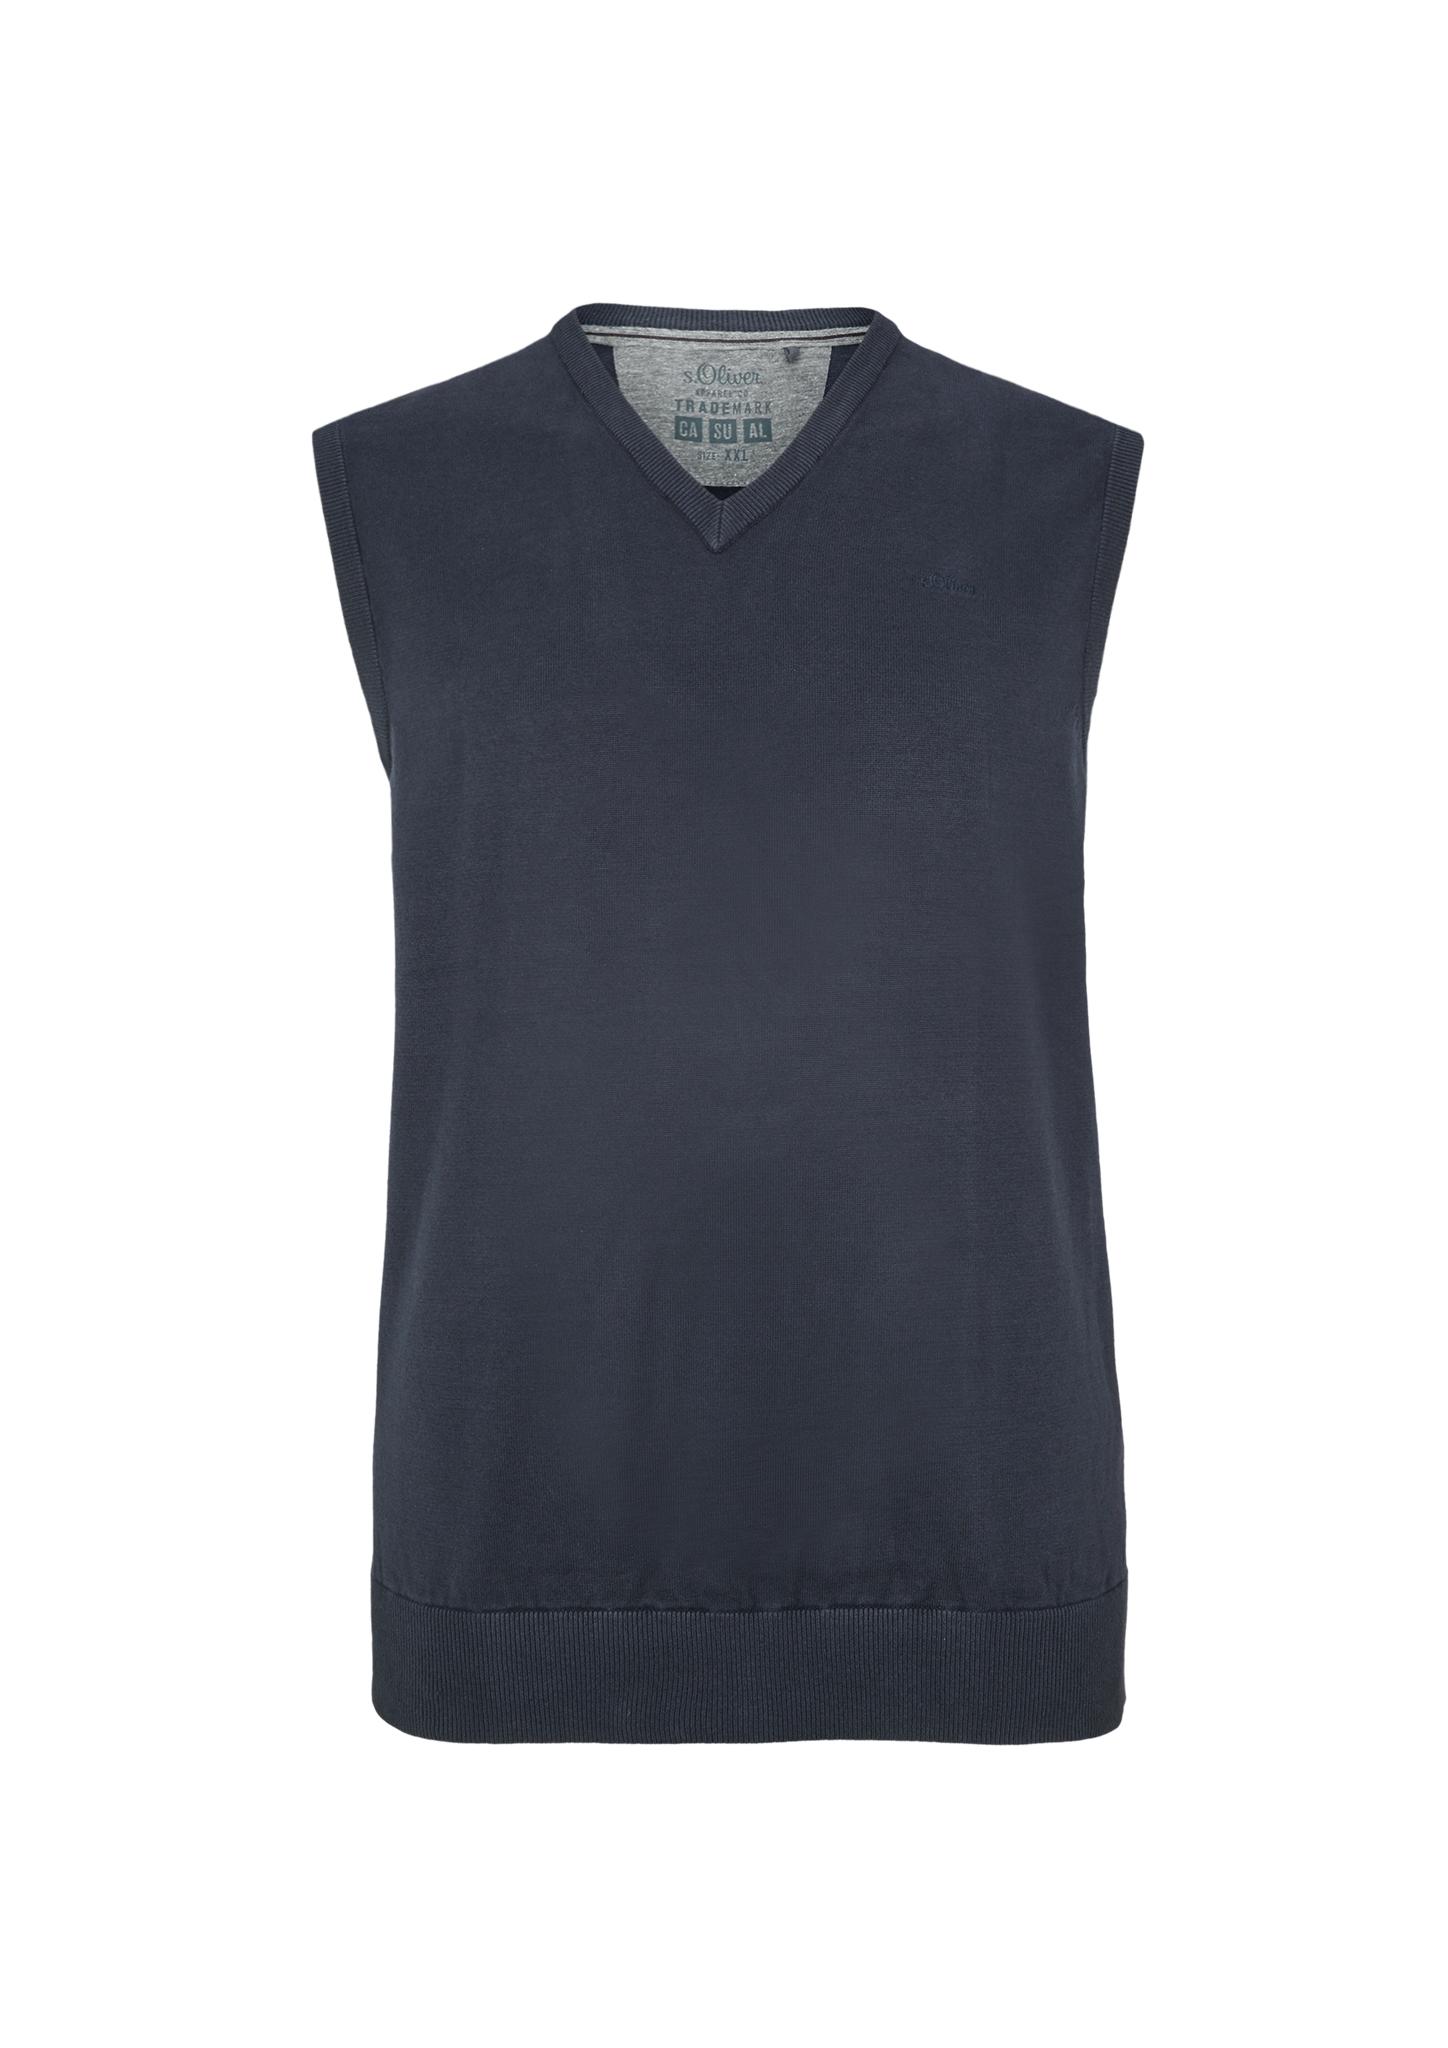 Pullunder | Bekleidung > Pullover > Pullunder | Blau | 100% baumwolle | s.Oliver Men Big Sizes